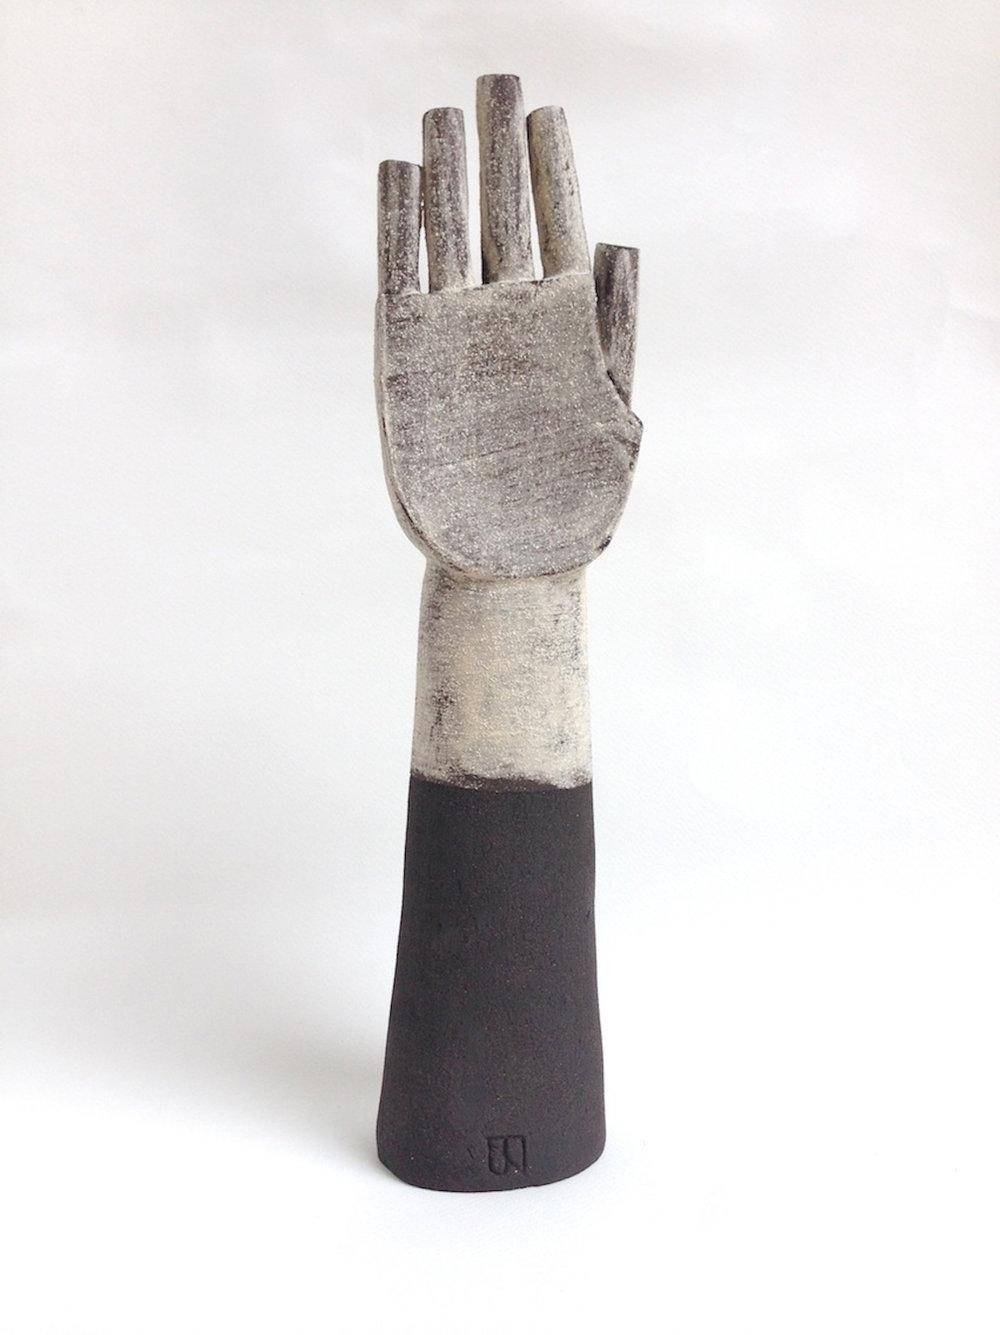 Title: White Glove Size: H 35 x W 12 x D 9 cm Medium: Black stoneware